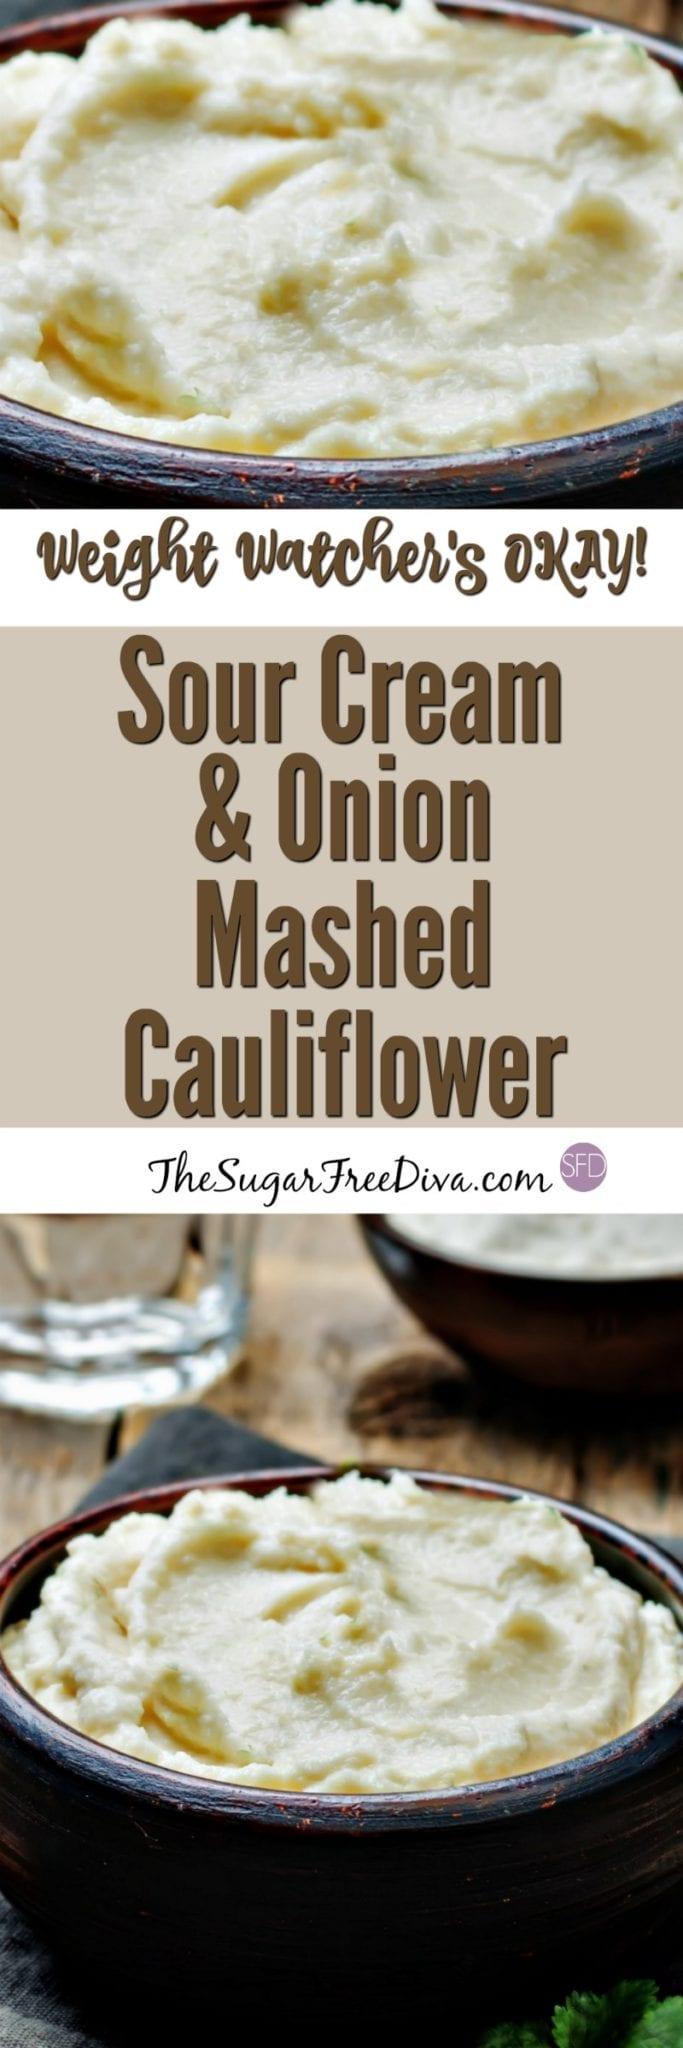 Weight Watchers Okay, Sour Cream and Onion Mashed Cauliflower